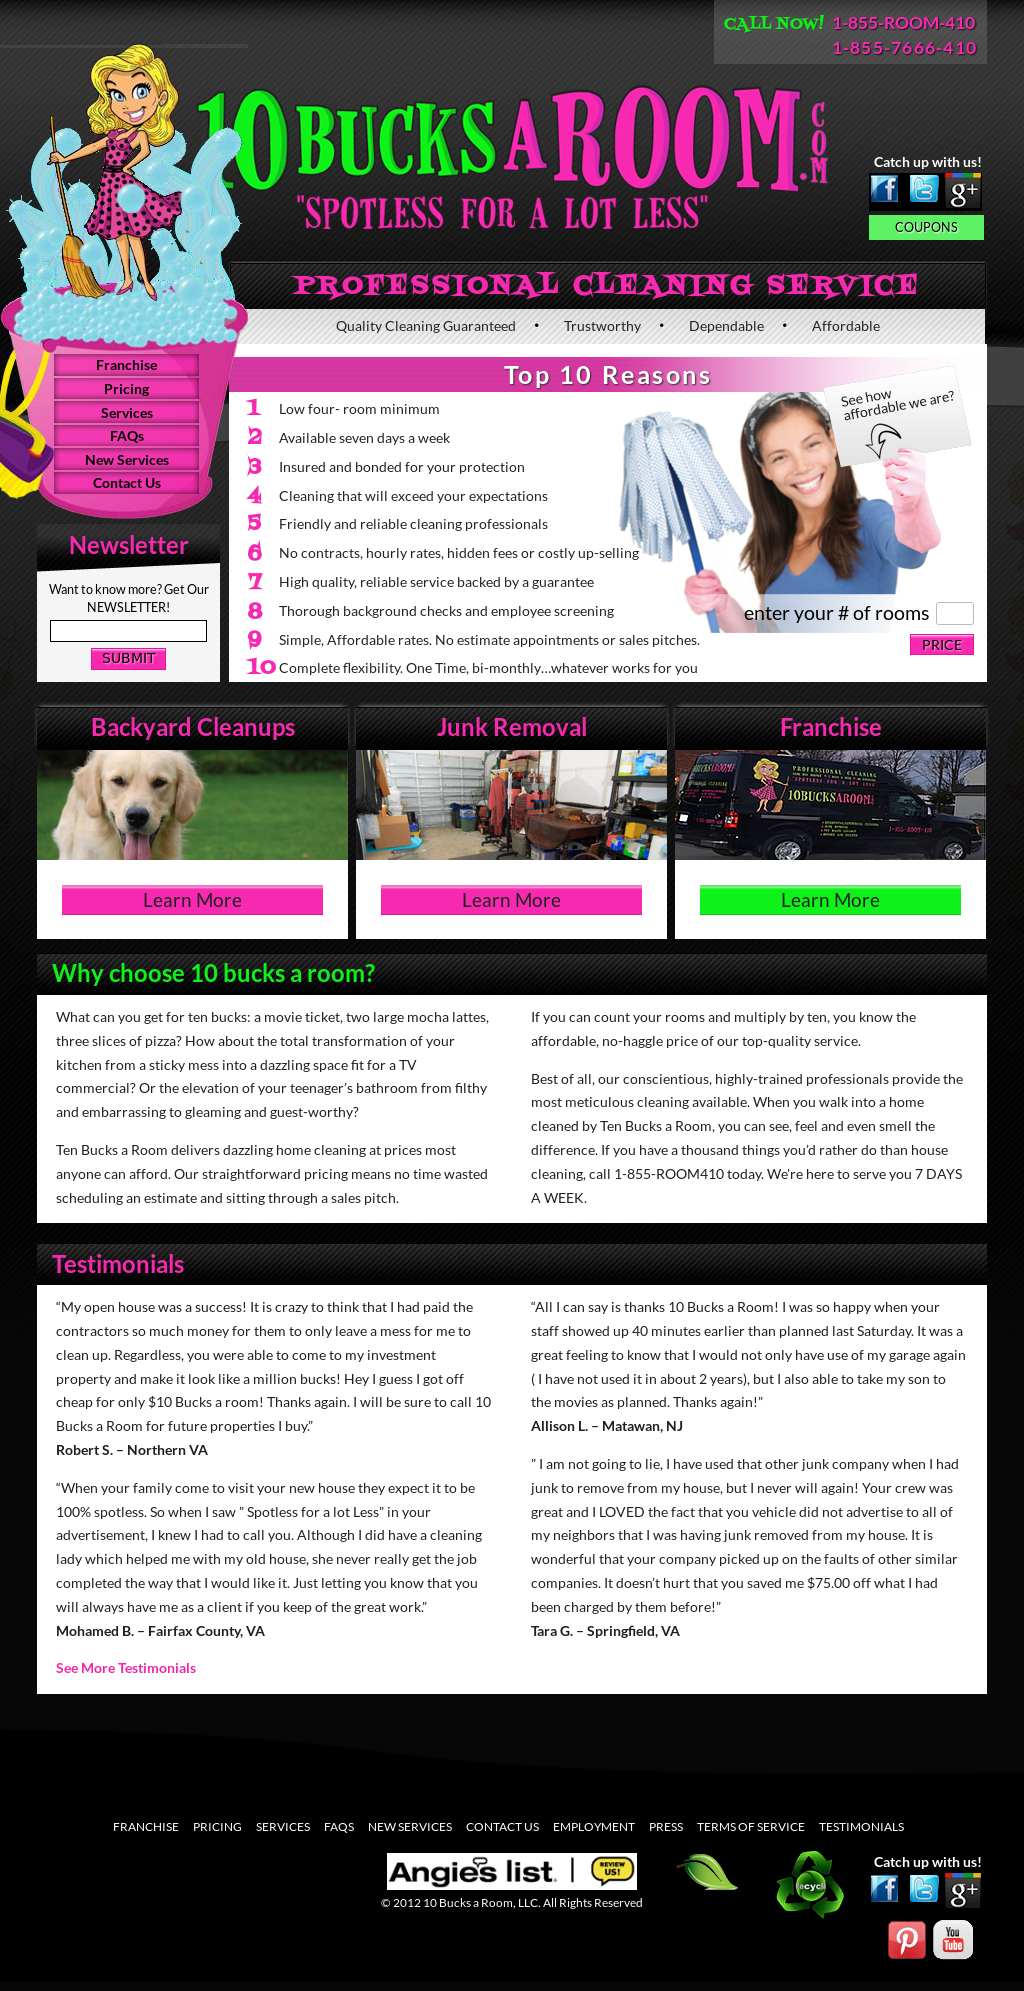 10Bucksaroom.com Competitors, Revenue and Employees - Owler Company ...